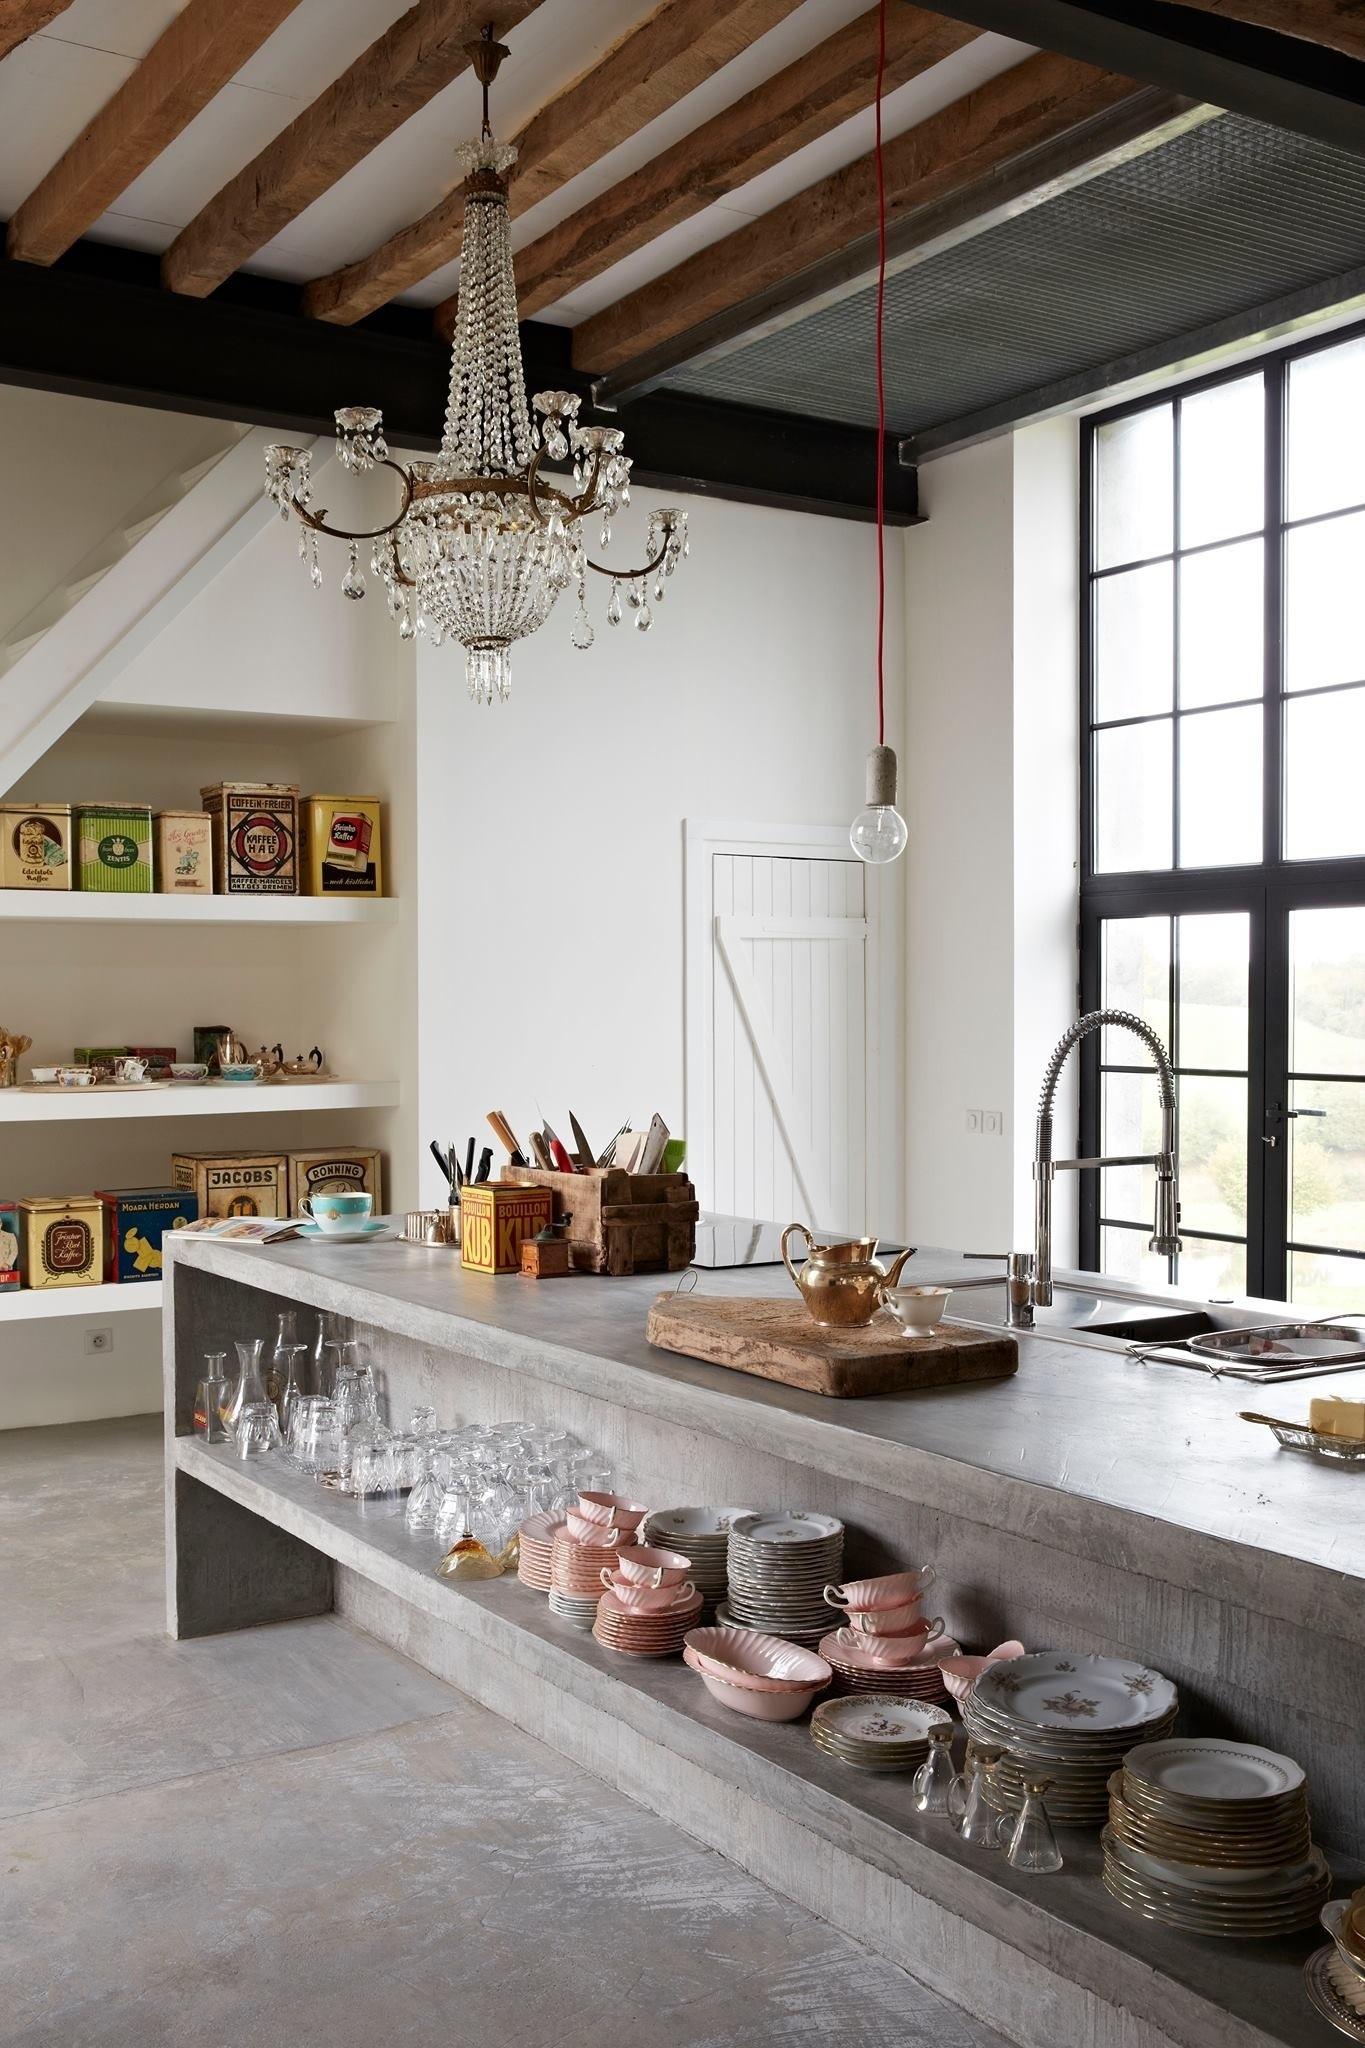 10x de mooiste keukens met beton  Alles om van je huis je